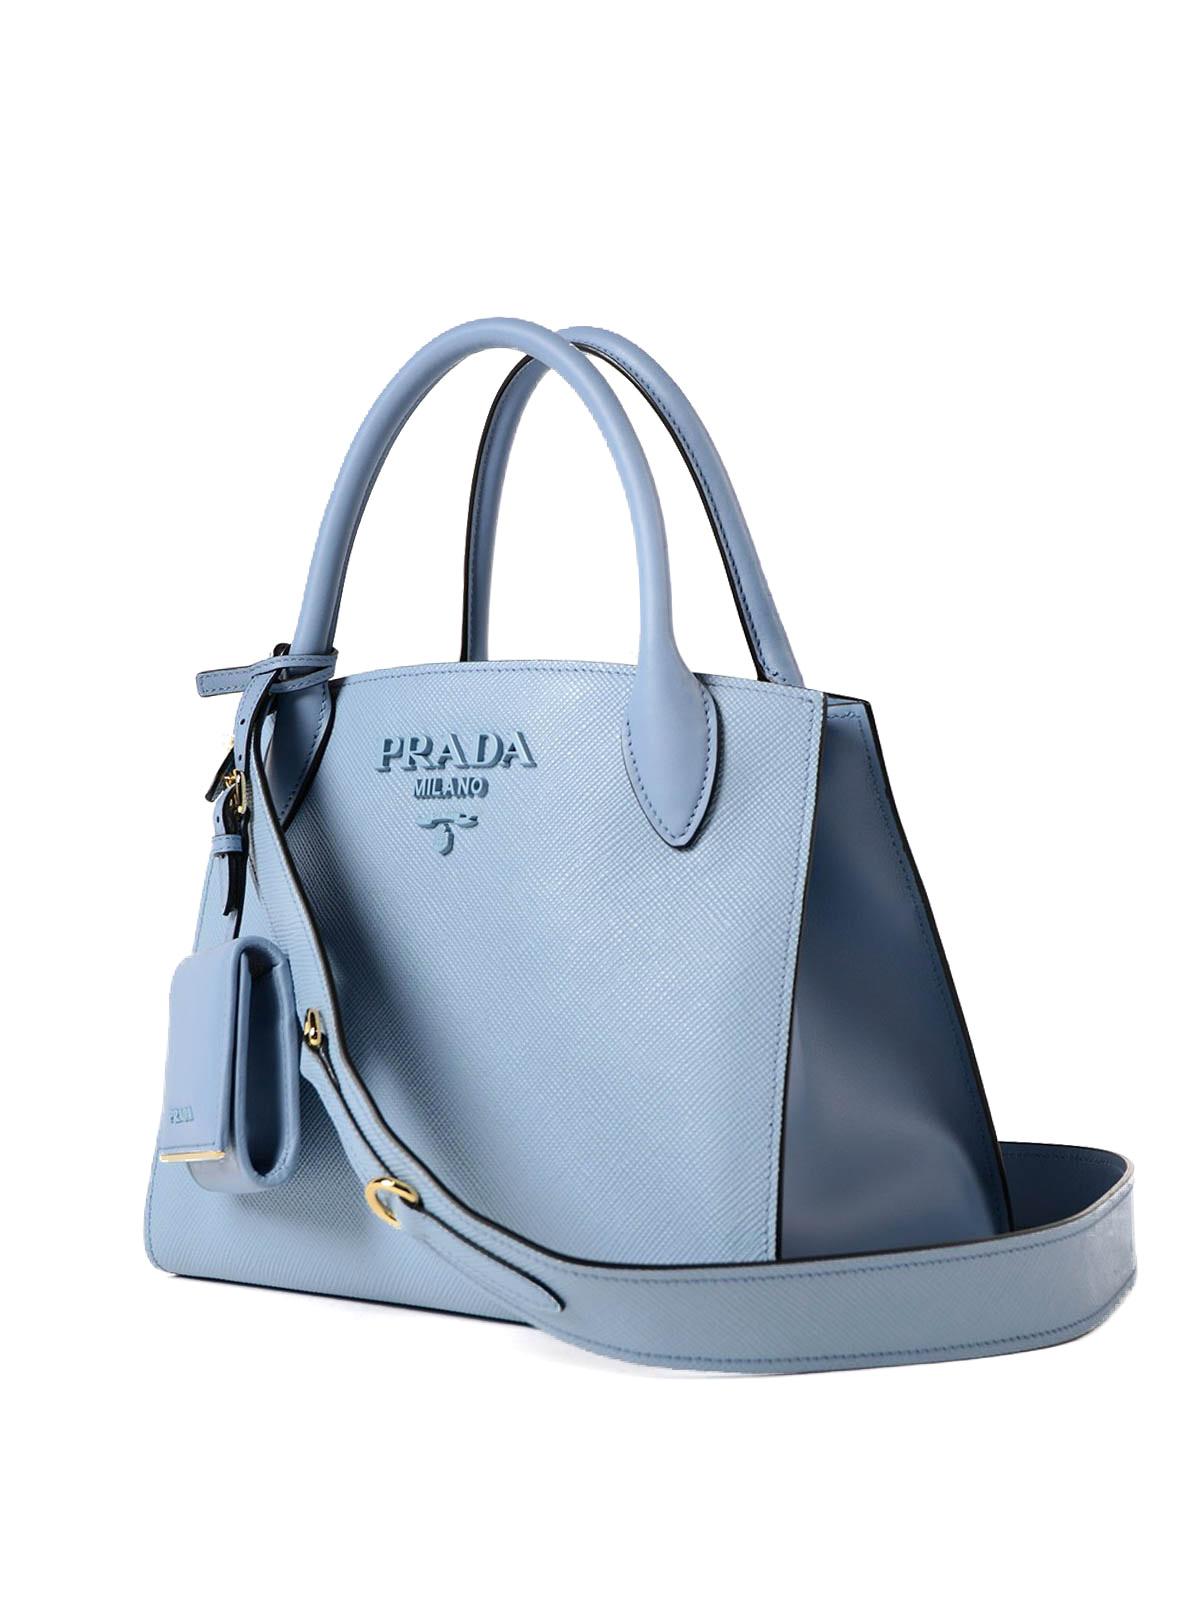 Prada Monochrome Saffiano Leather Bag Totes Bags 1ba1562erxf0637